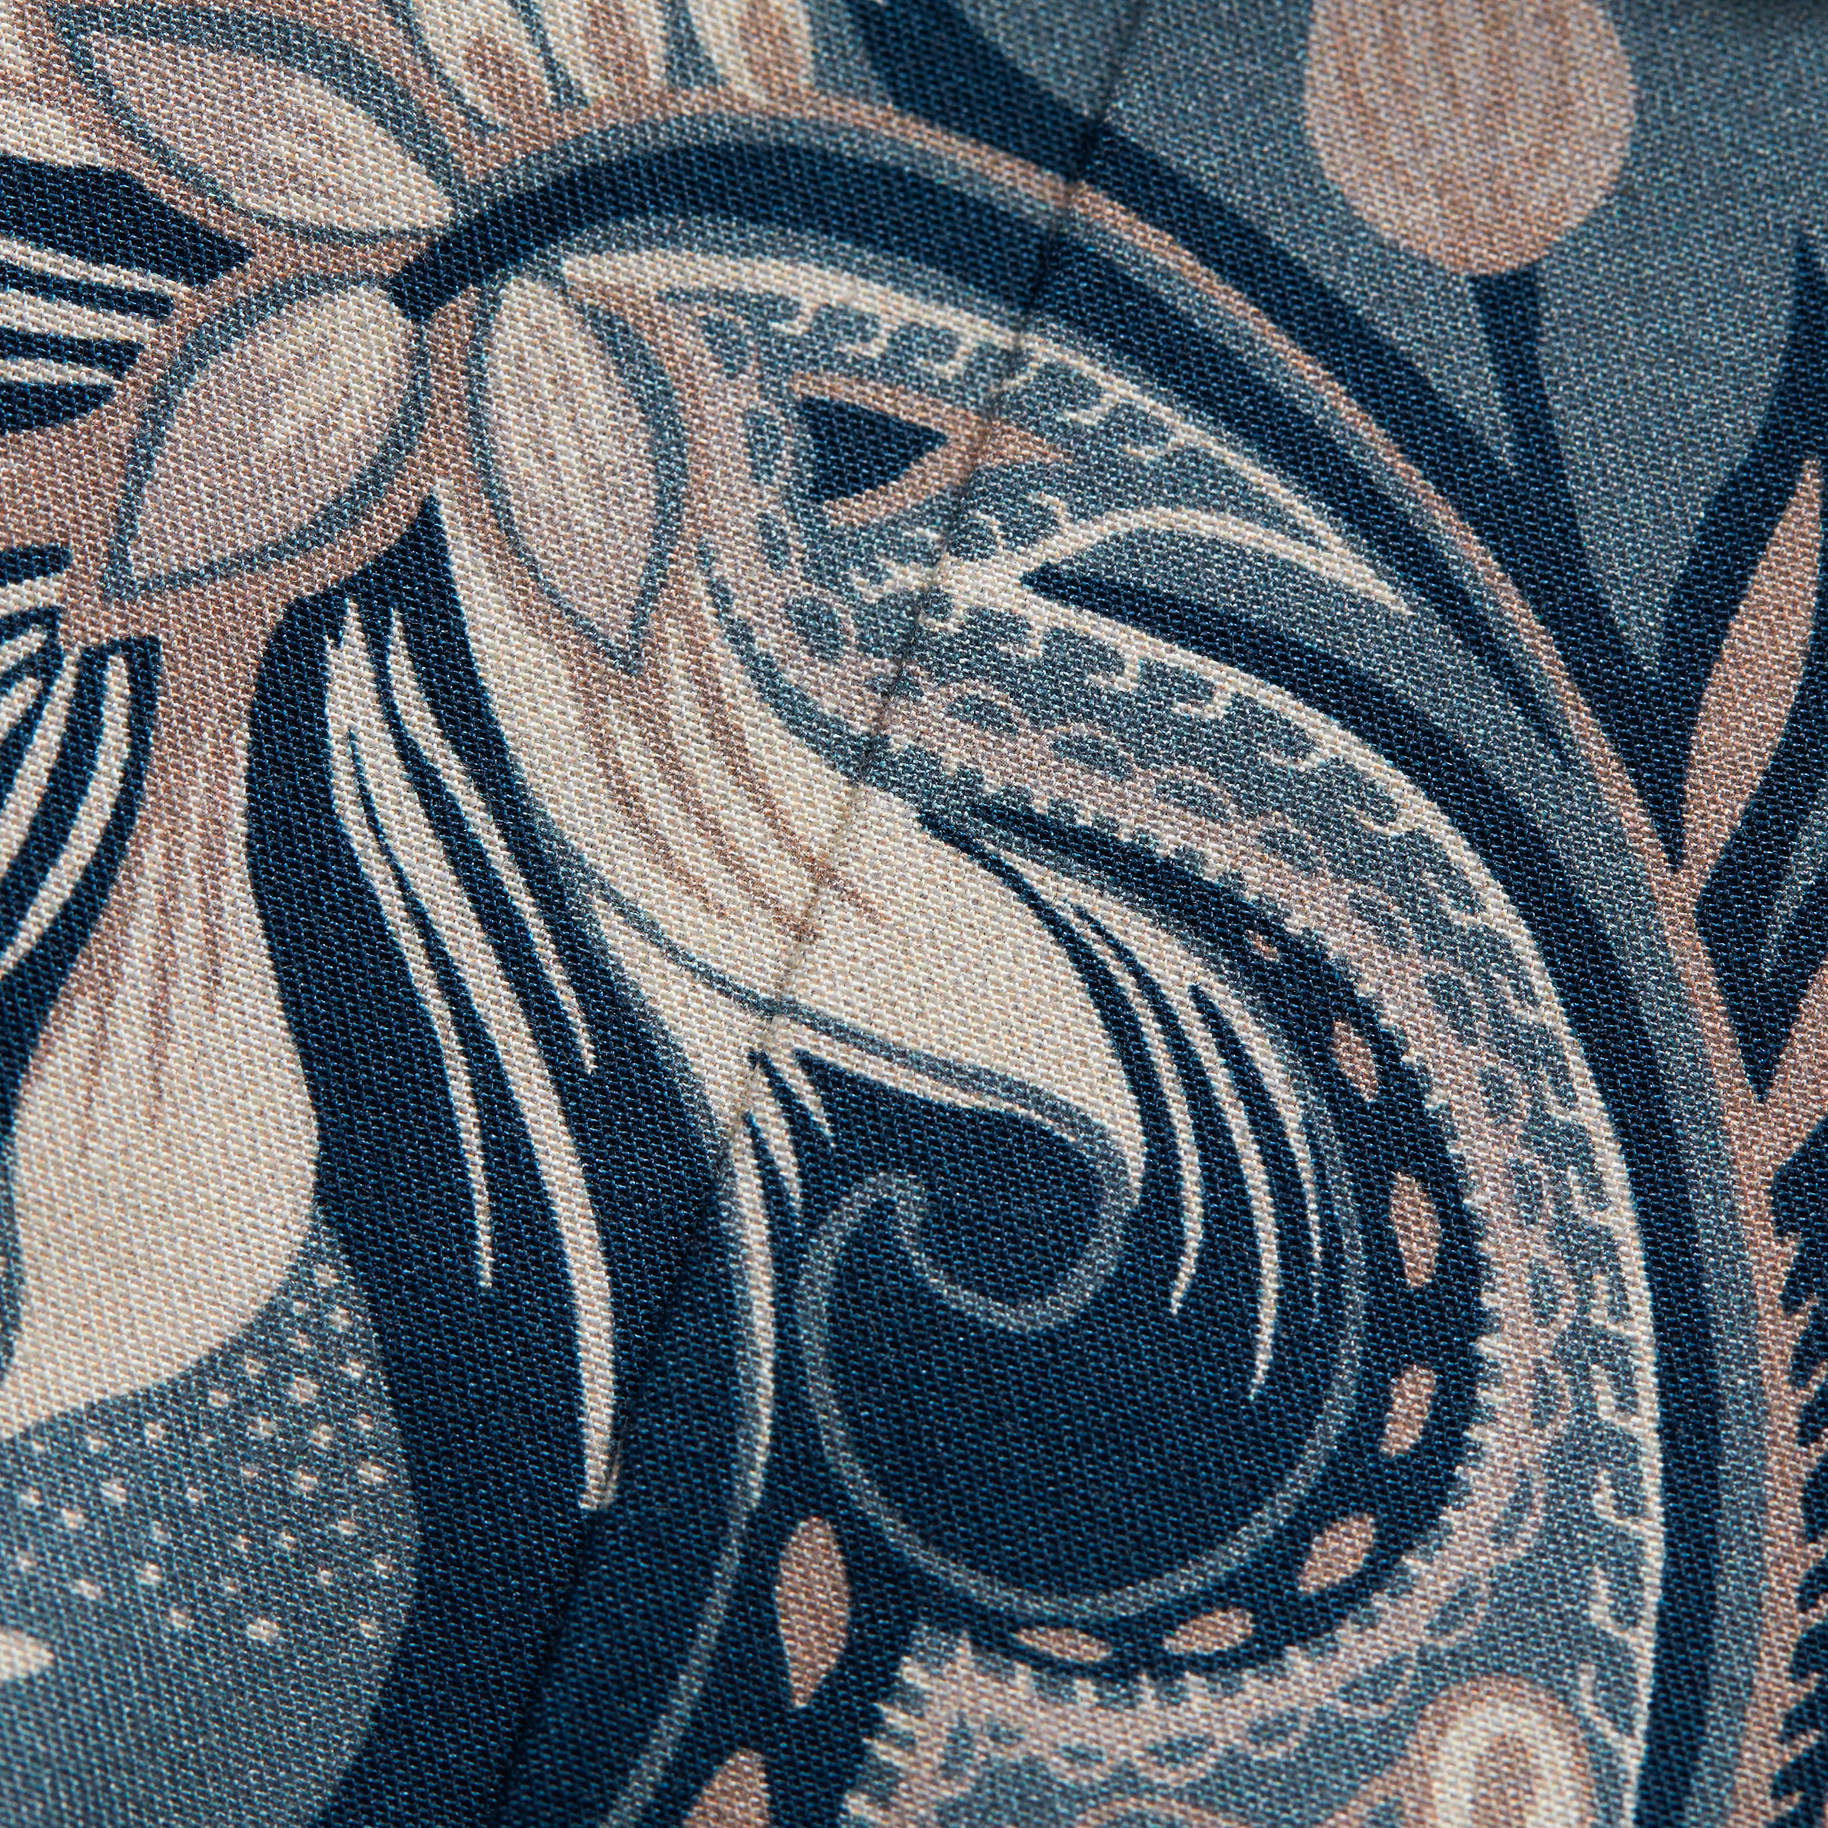 Eton Floral Motif on luxury Twill